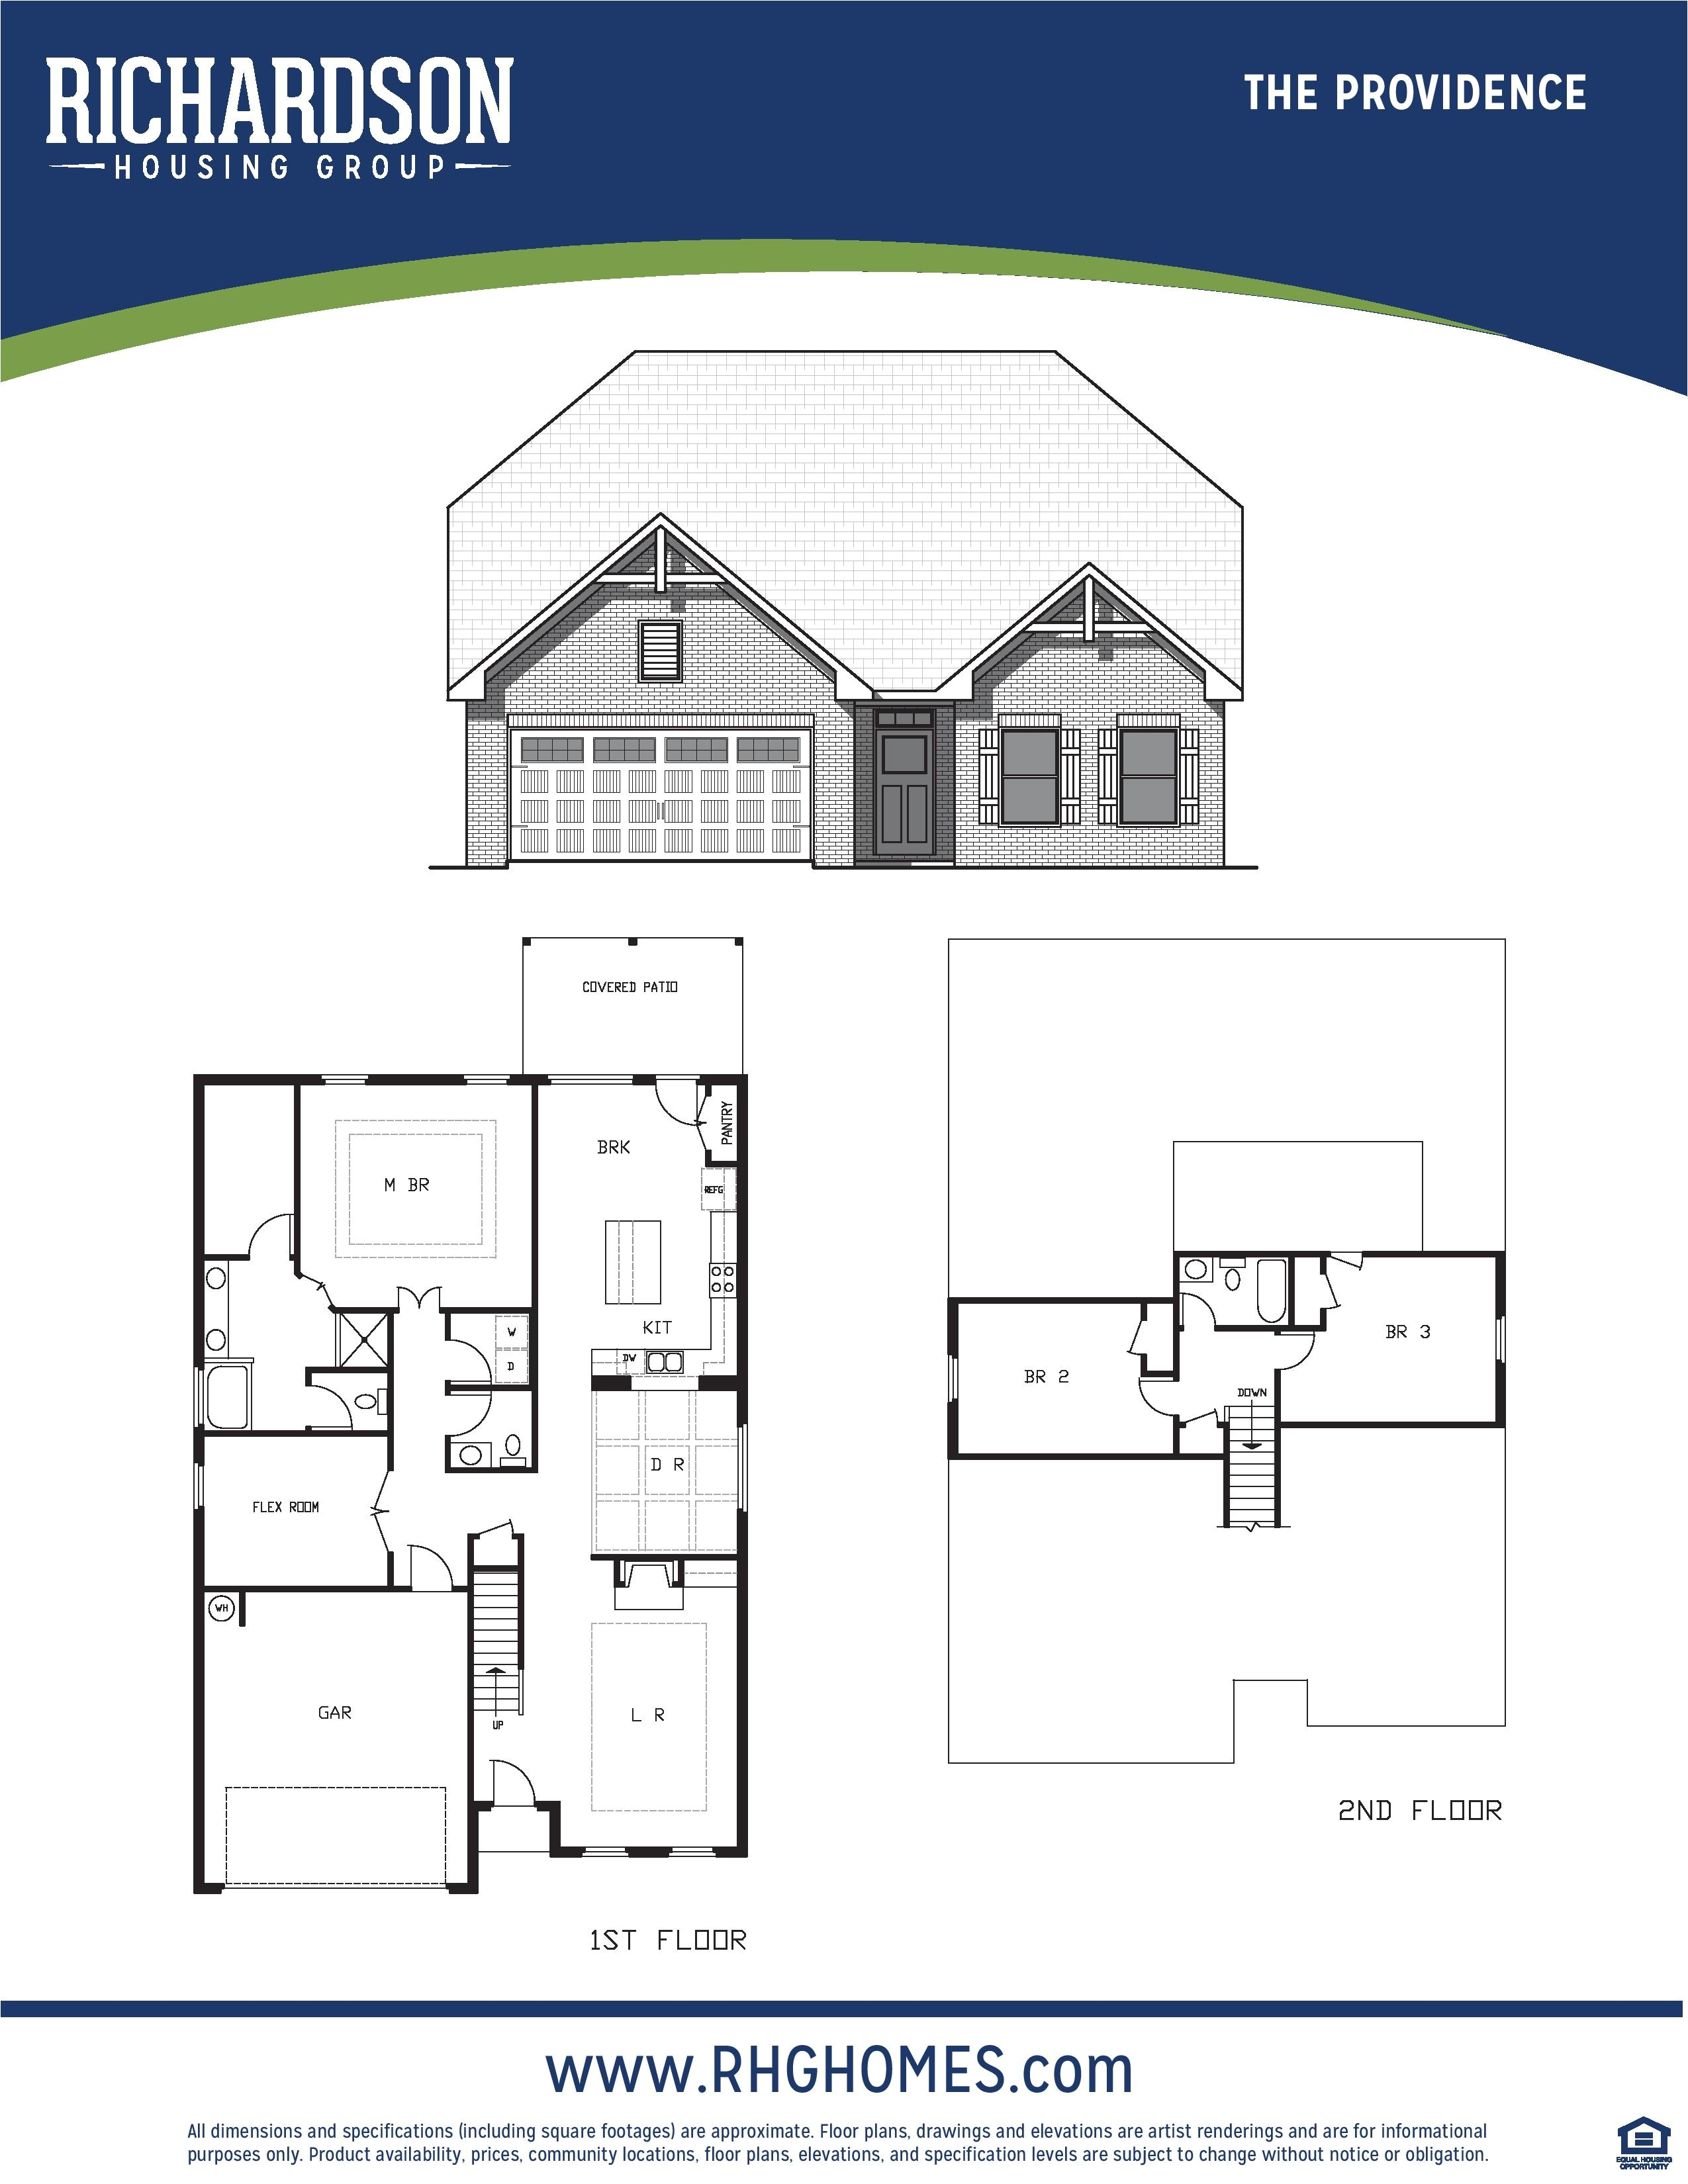 richardson housing group floor plans